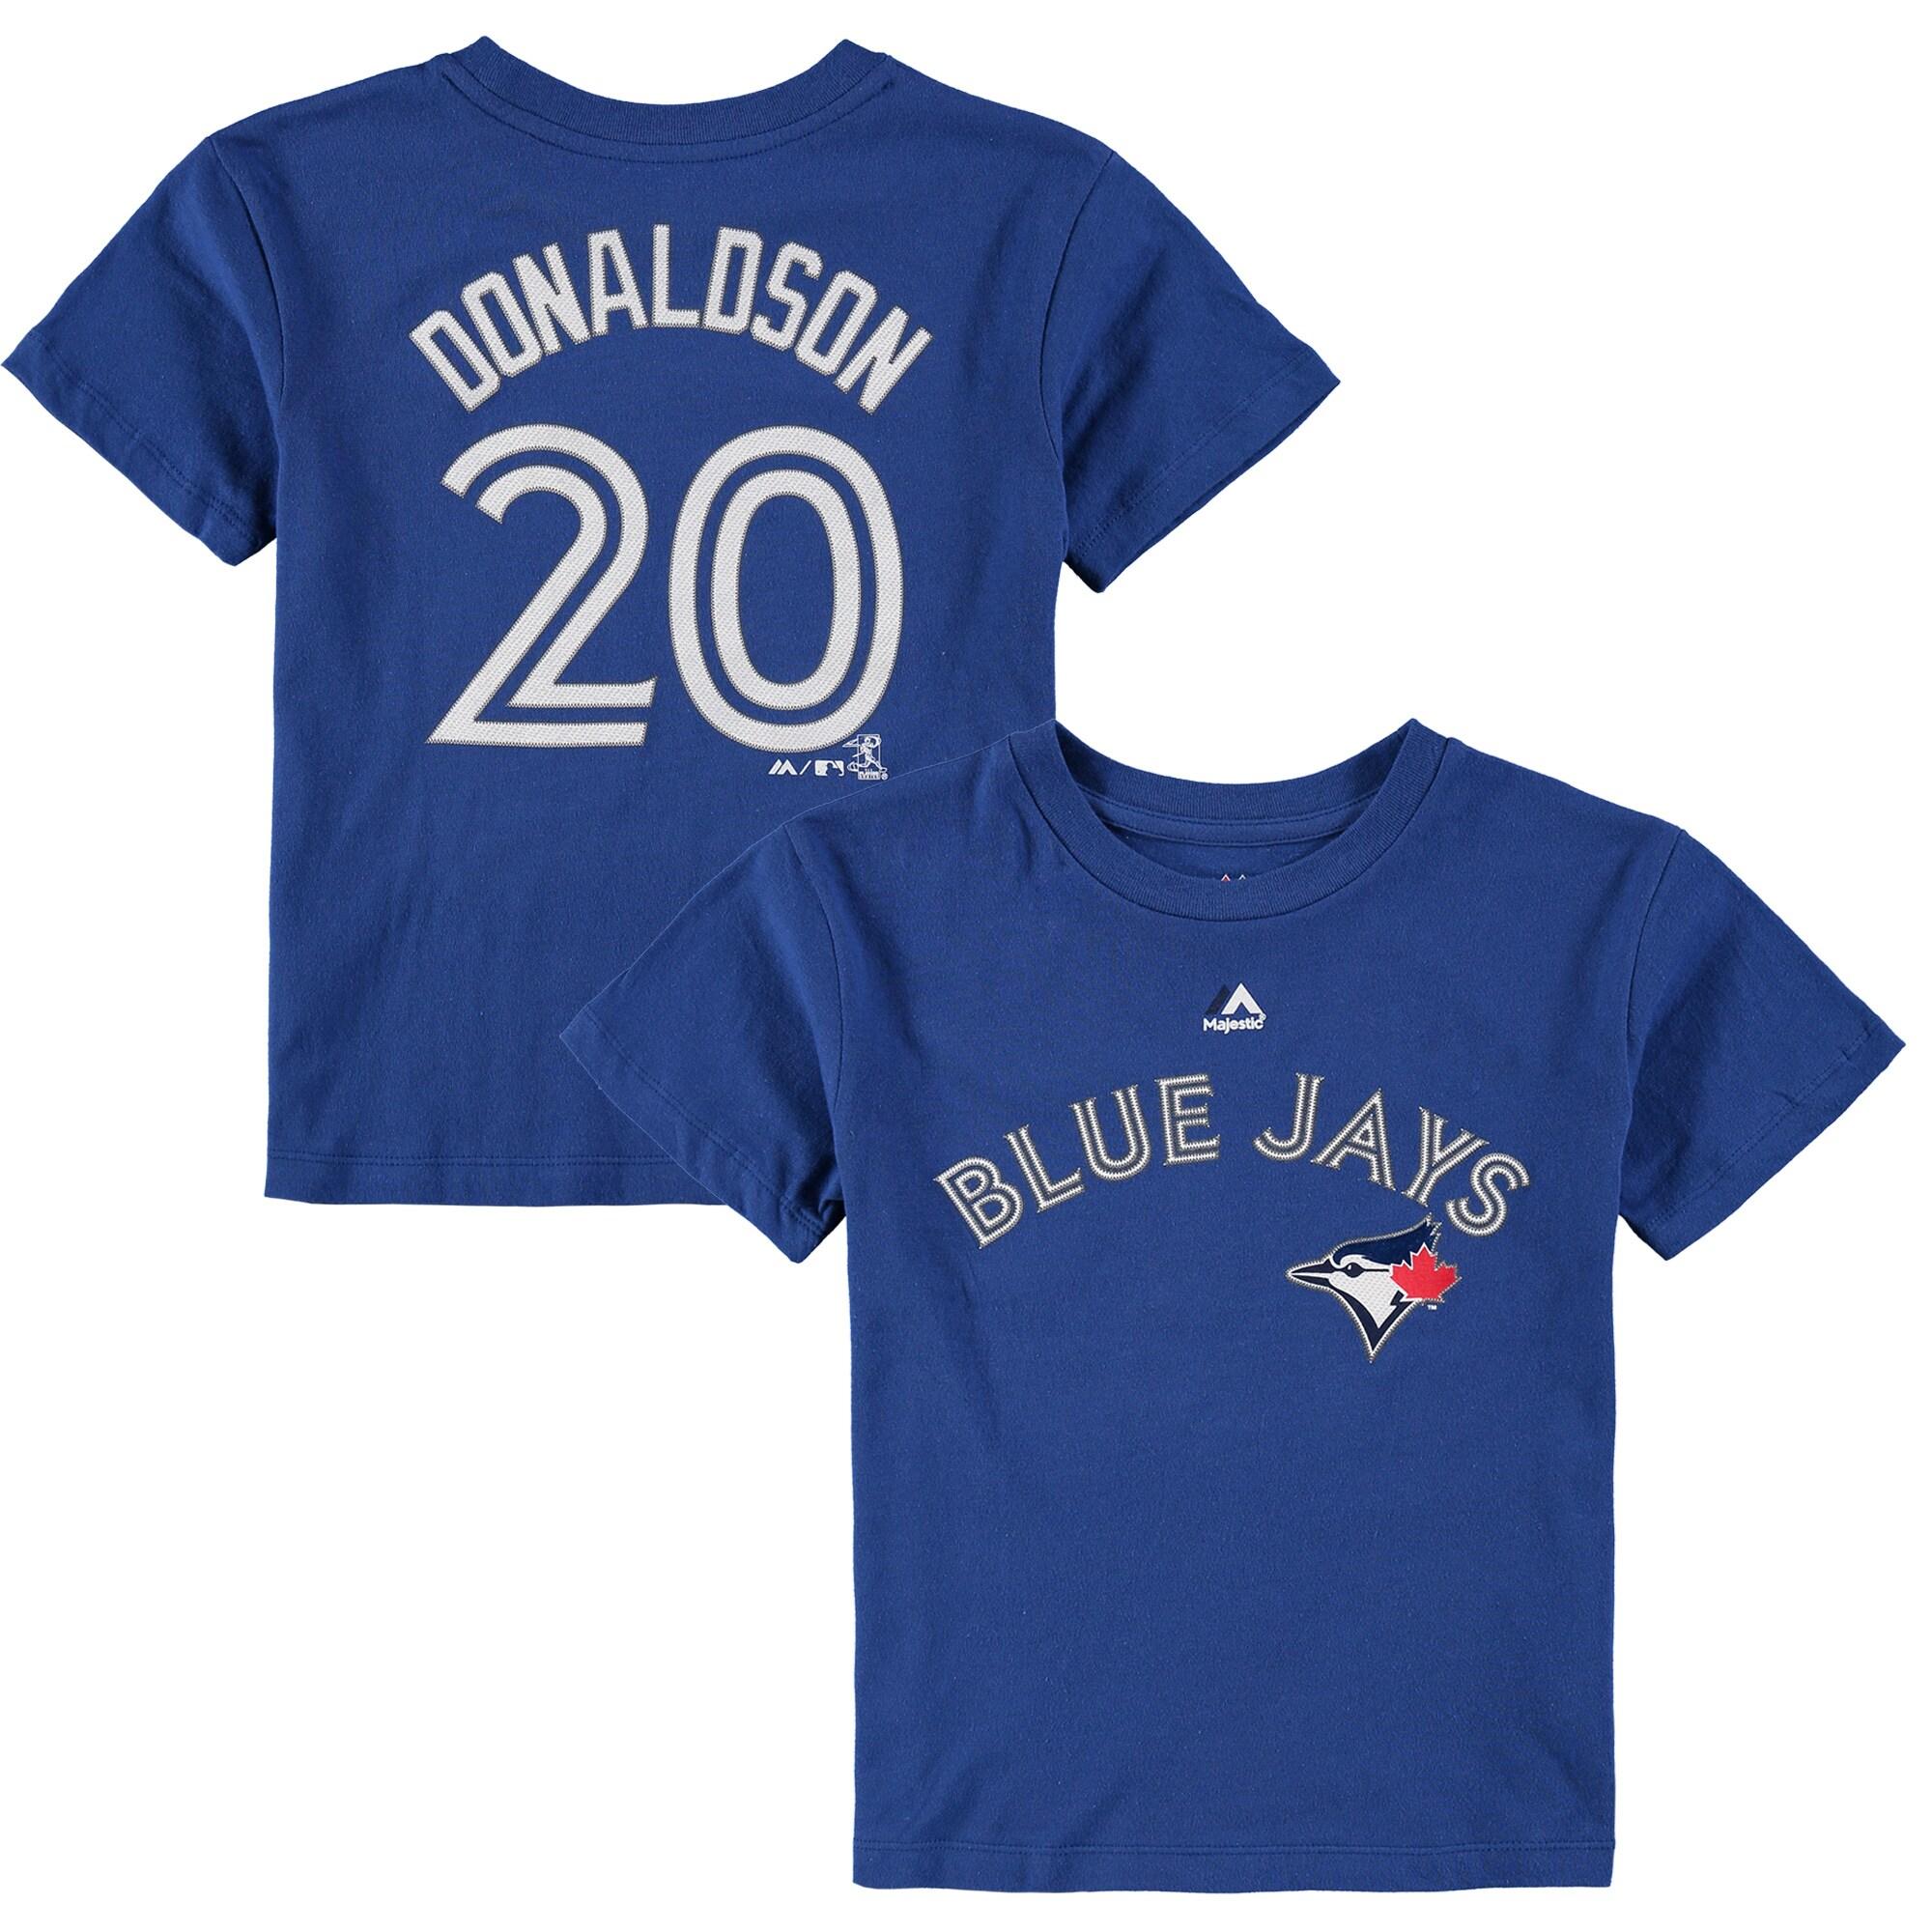 Josh Donaldson Toronto Blue Jays Preschool Player Name & Number T-Shirt - Royal